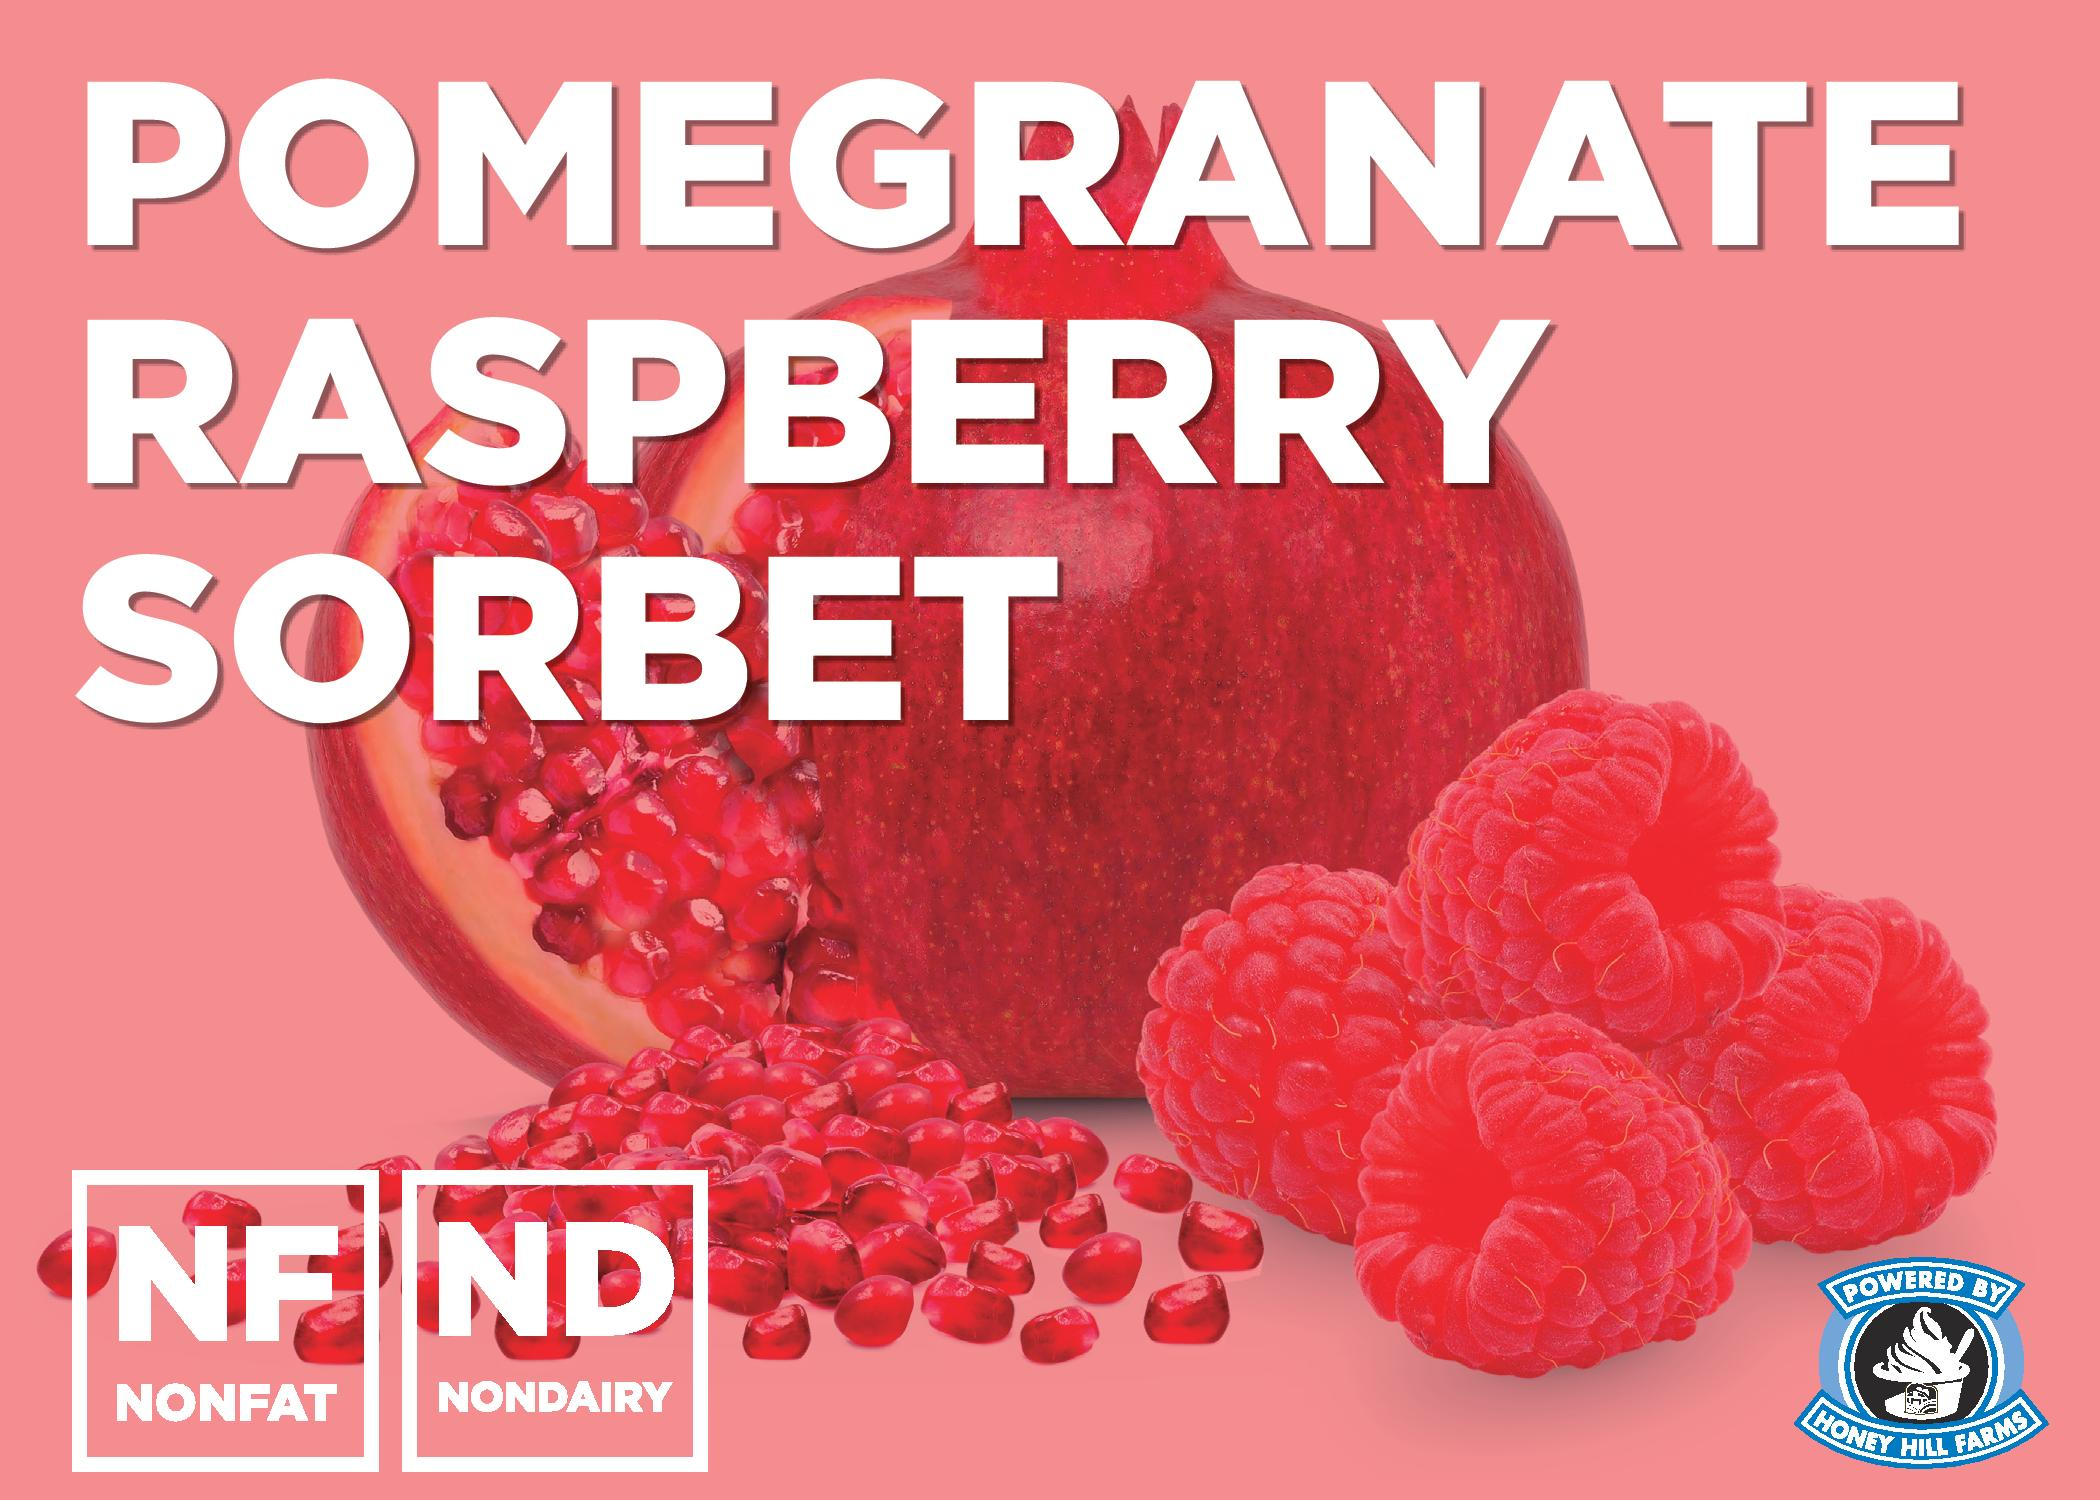 Pomegranate Raspberry Sorbet